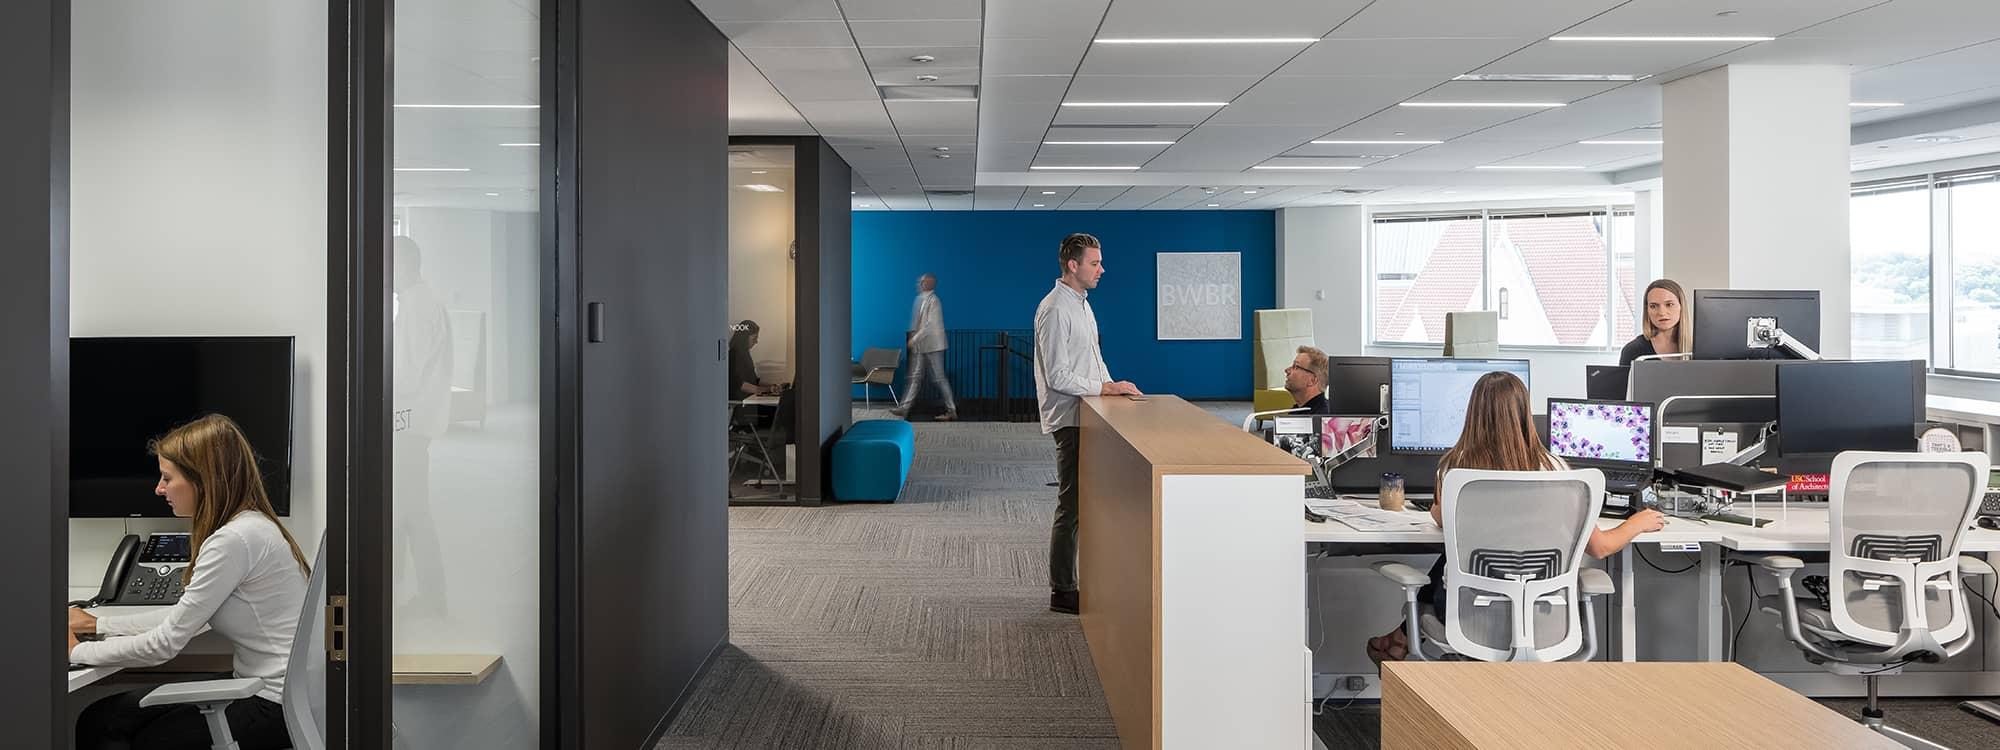 Workstations in BWBR's Saint Paul, Minnesota headquarters office.